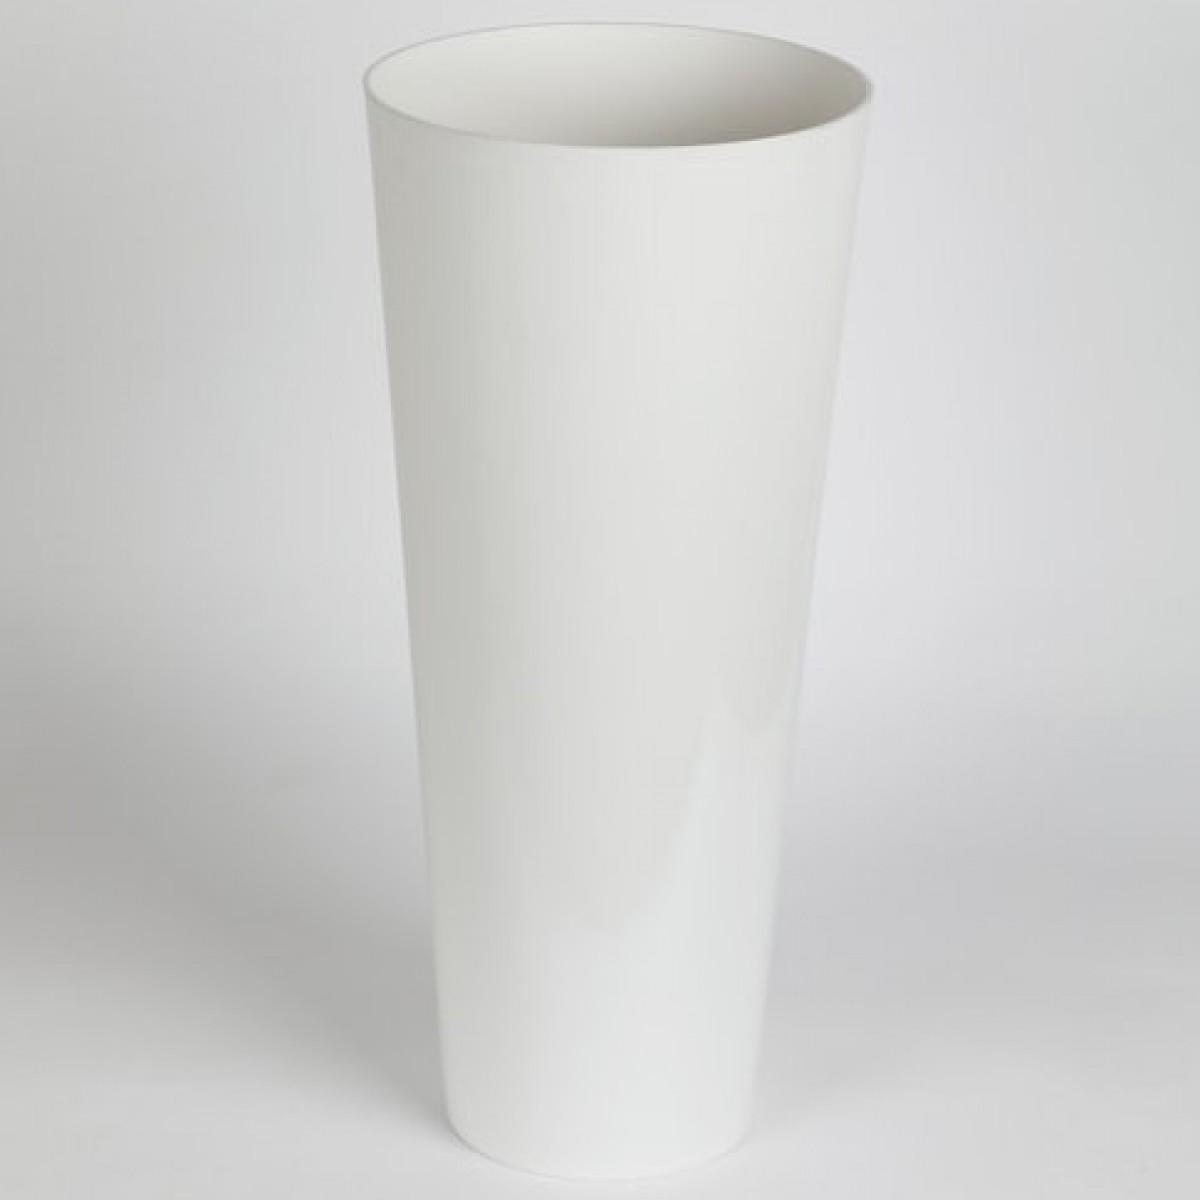 Conical White 25x55cm Acrylic Vase - 1 No